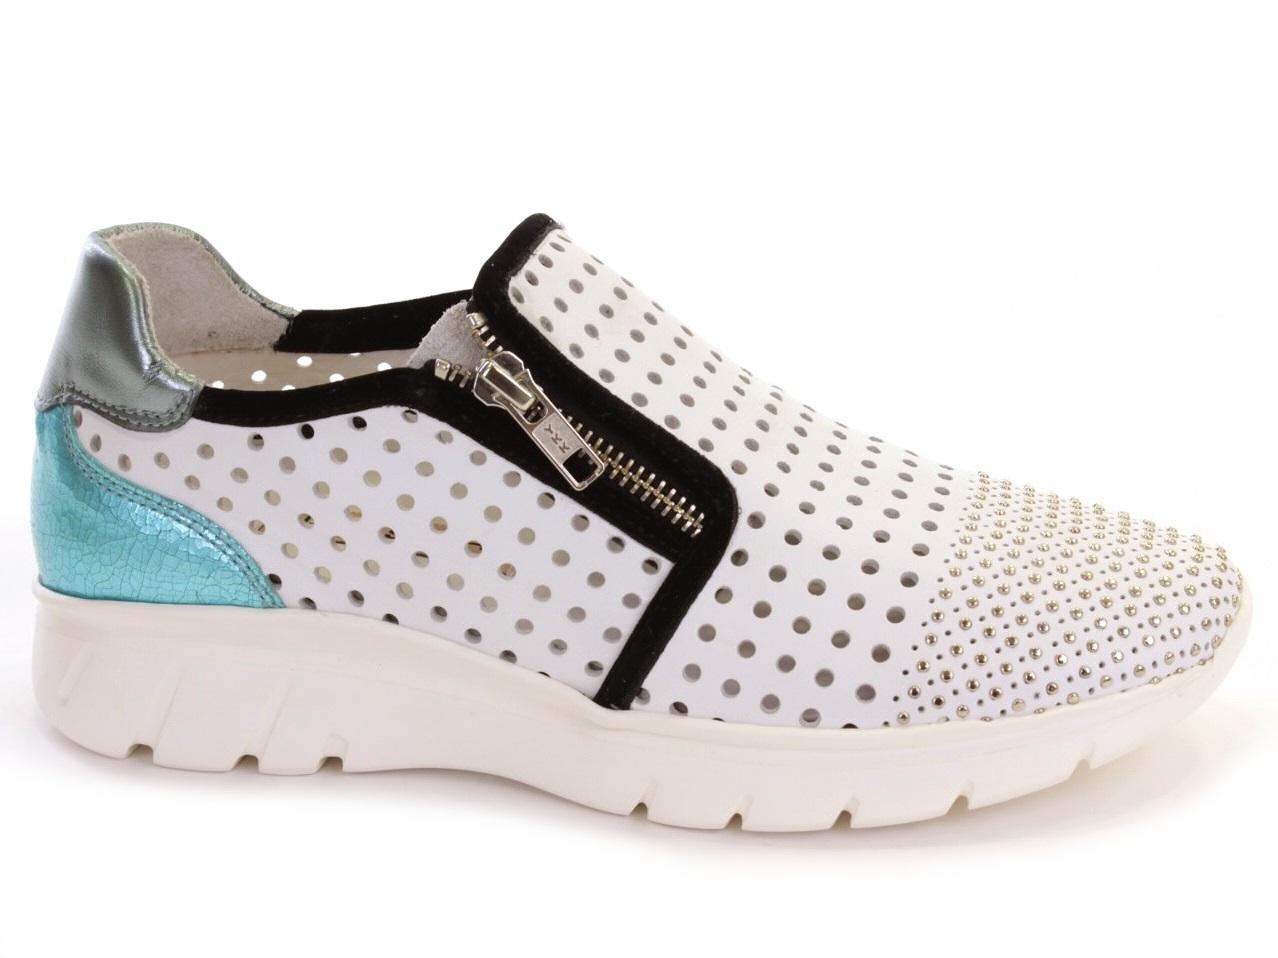 Sneakers and Espadrilles Helsar - 032 10567